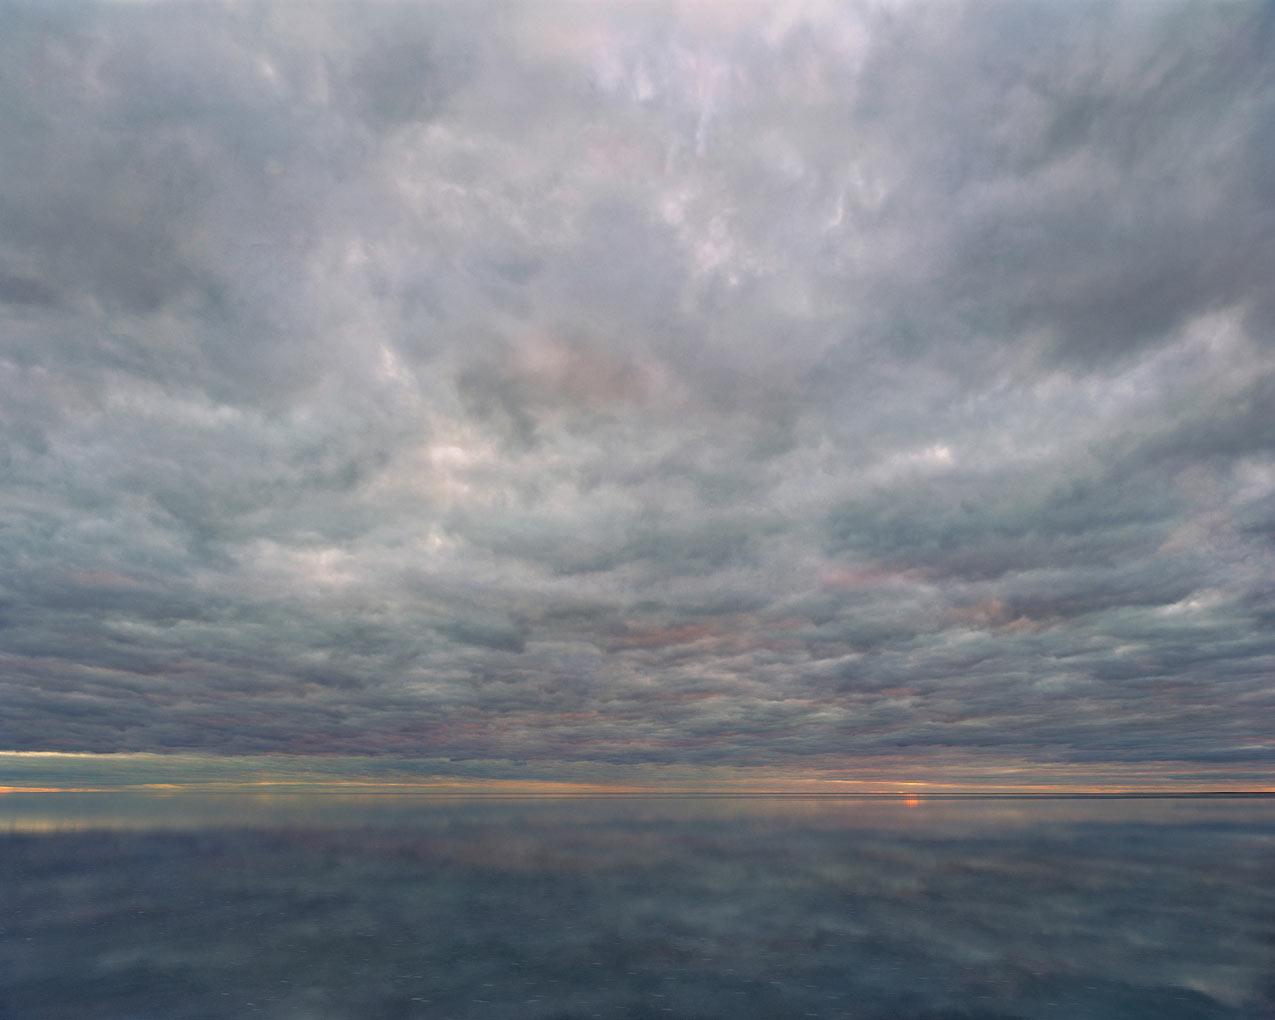 Salt 16, 120cm x 150cm, digital pigment print on cotton rag. edition of 7, 2005